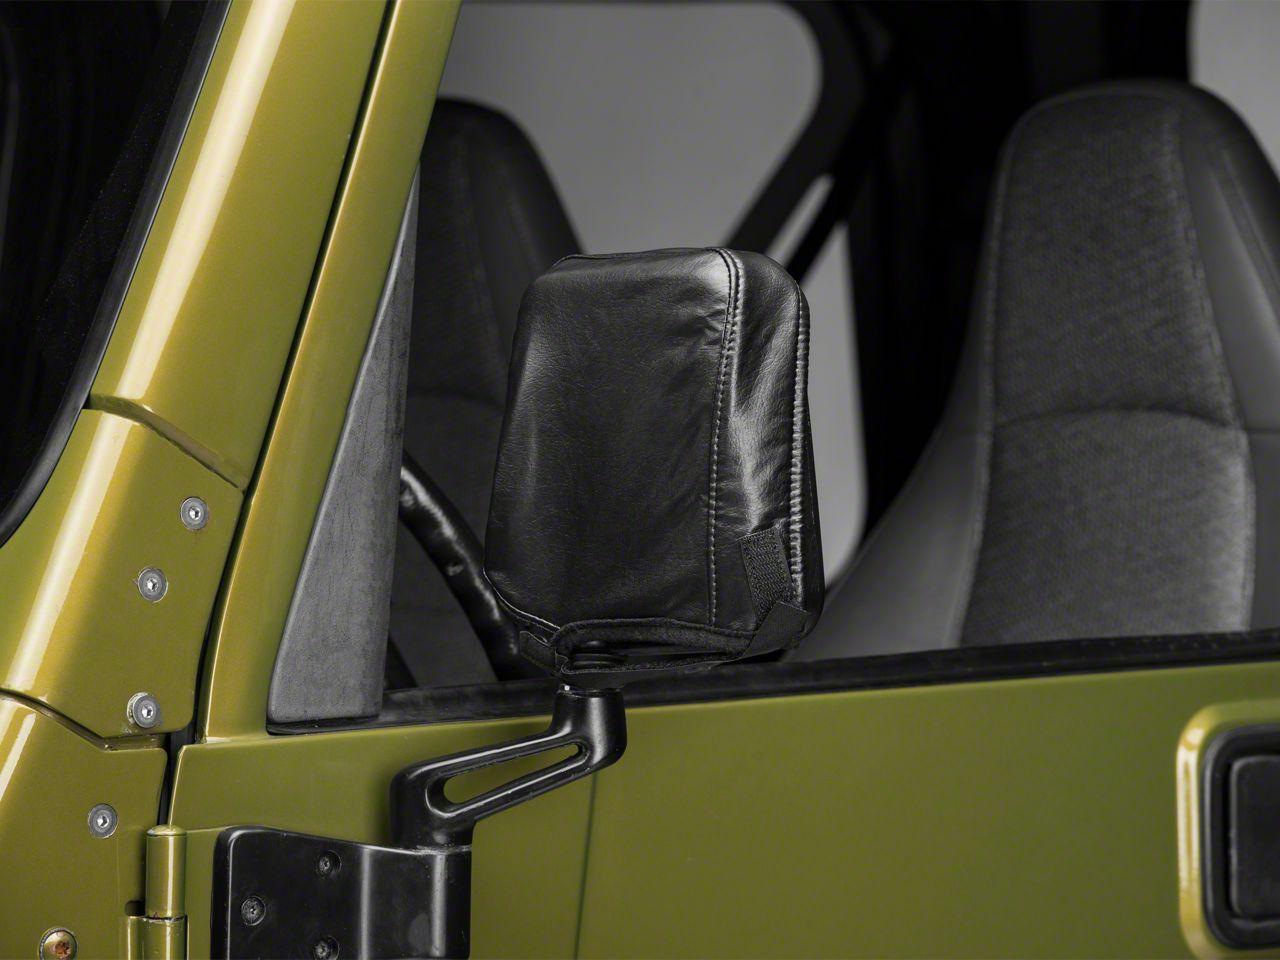 Covercraft Colgan Mirror Bra - Black Vinyl (87-06 Jeep Wrangler YJ & TJ)